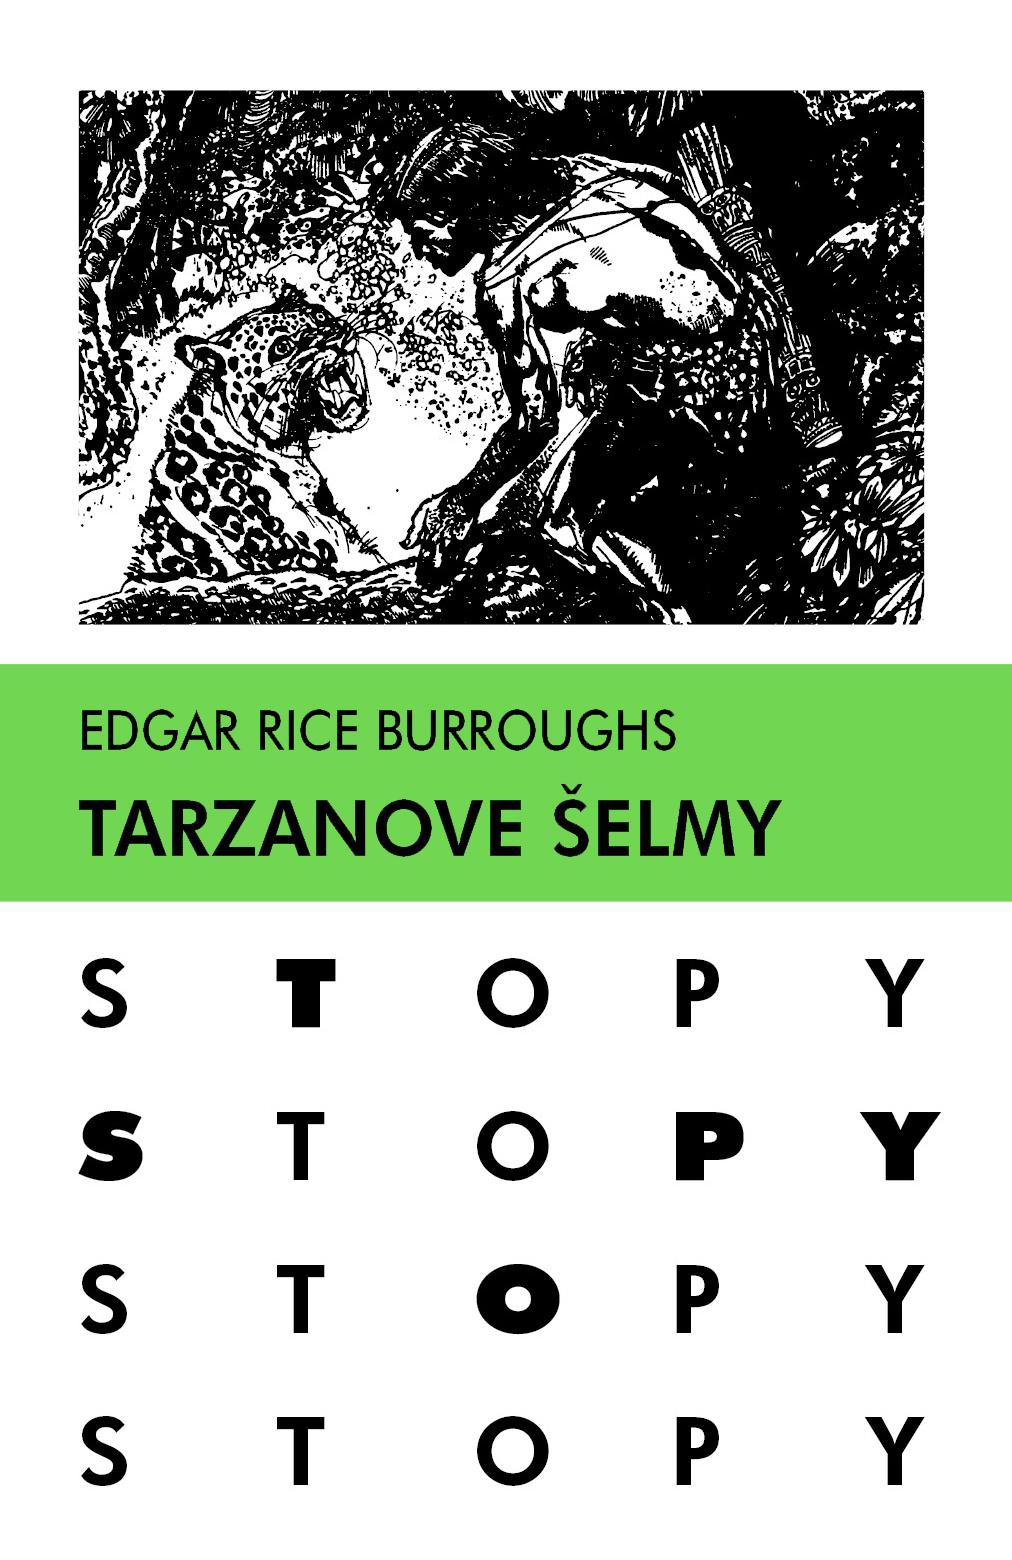 Tarzanove šelmy - Tarzan 3